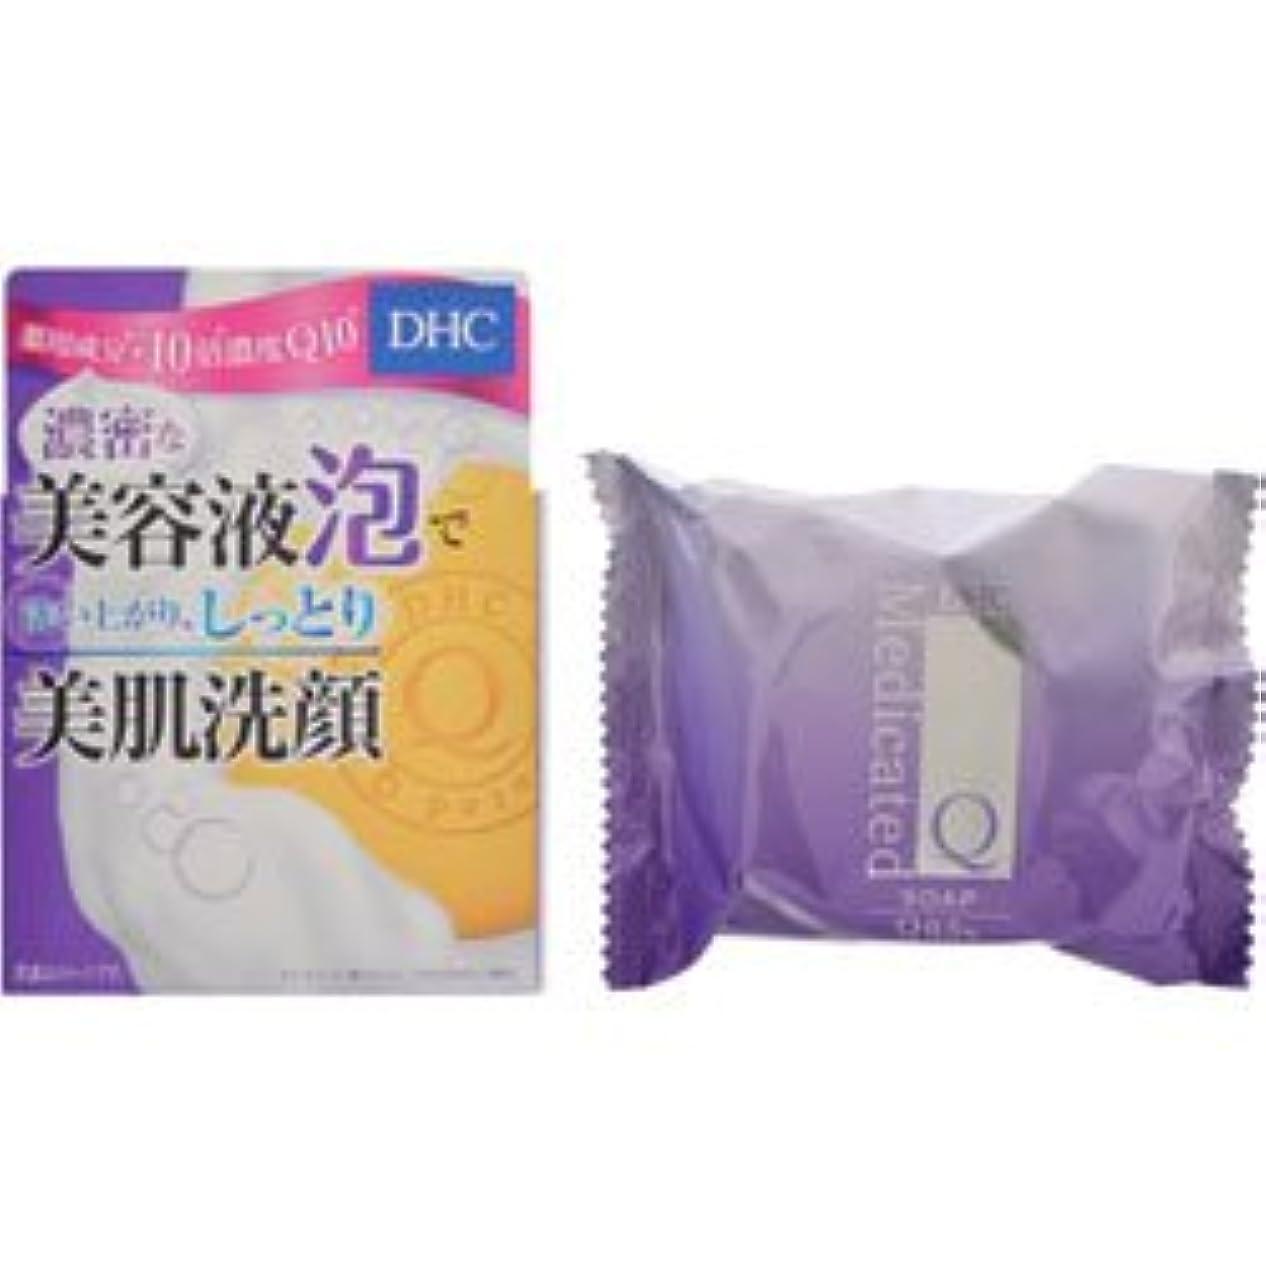 【DHC】DHC 薬用Qソープ SS 60g ×10個セット